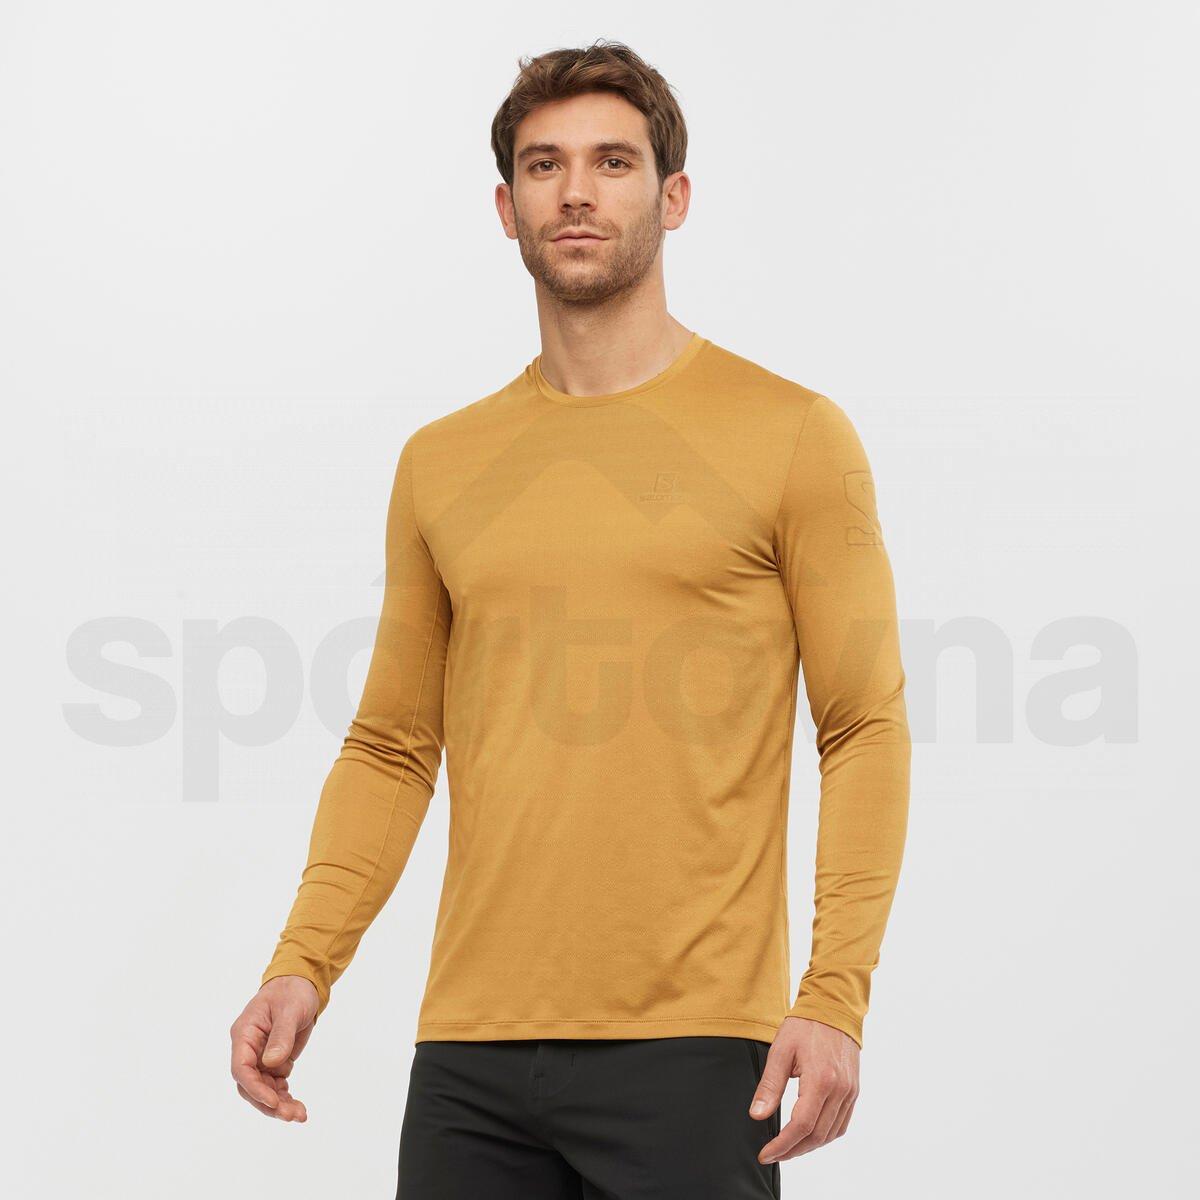 Tričko Salomon XA LONG SLEEVE TEE M - hnědá/žlutá